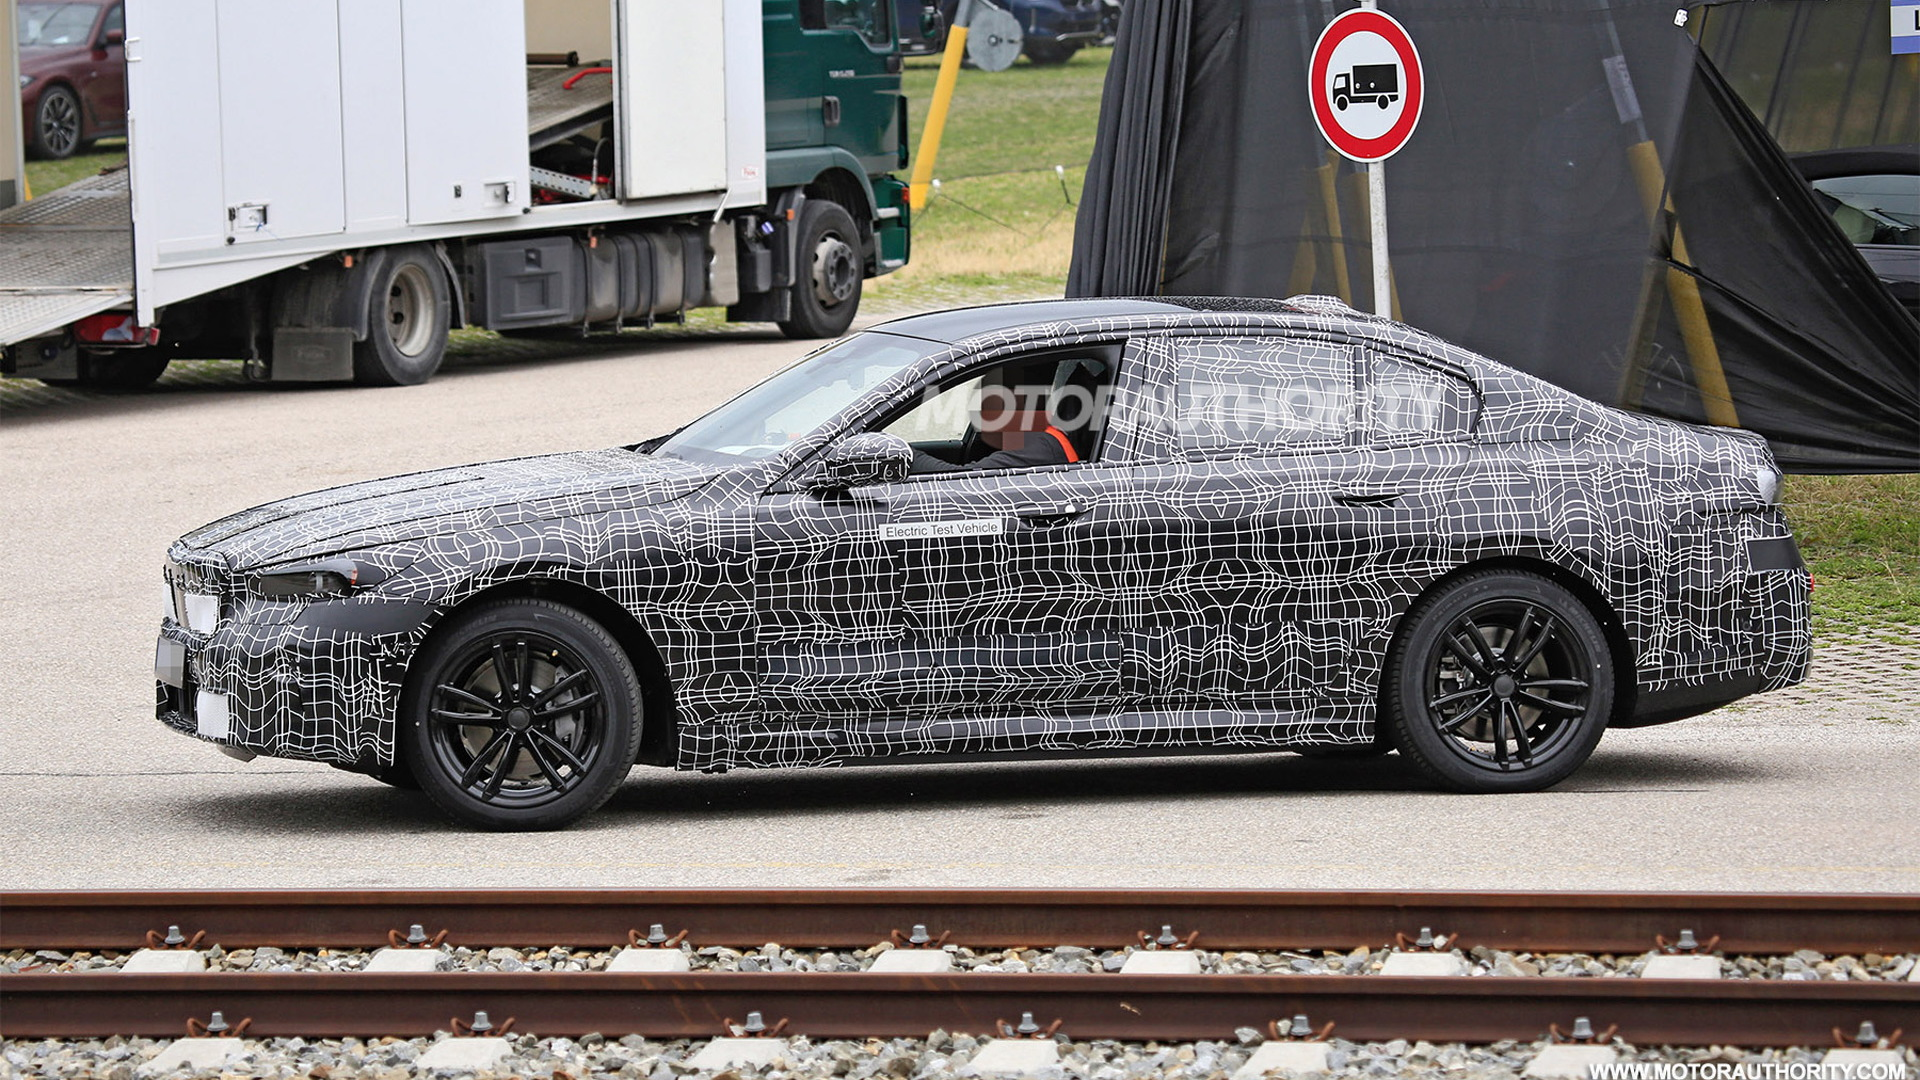 2024 BMW i5 (electric 5-Series) spy shots - Photo credit: S. Baldauf/SB-Medien